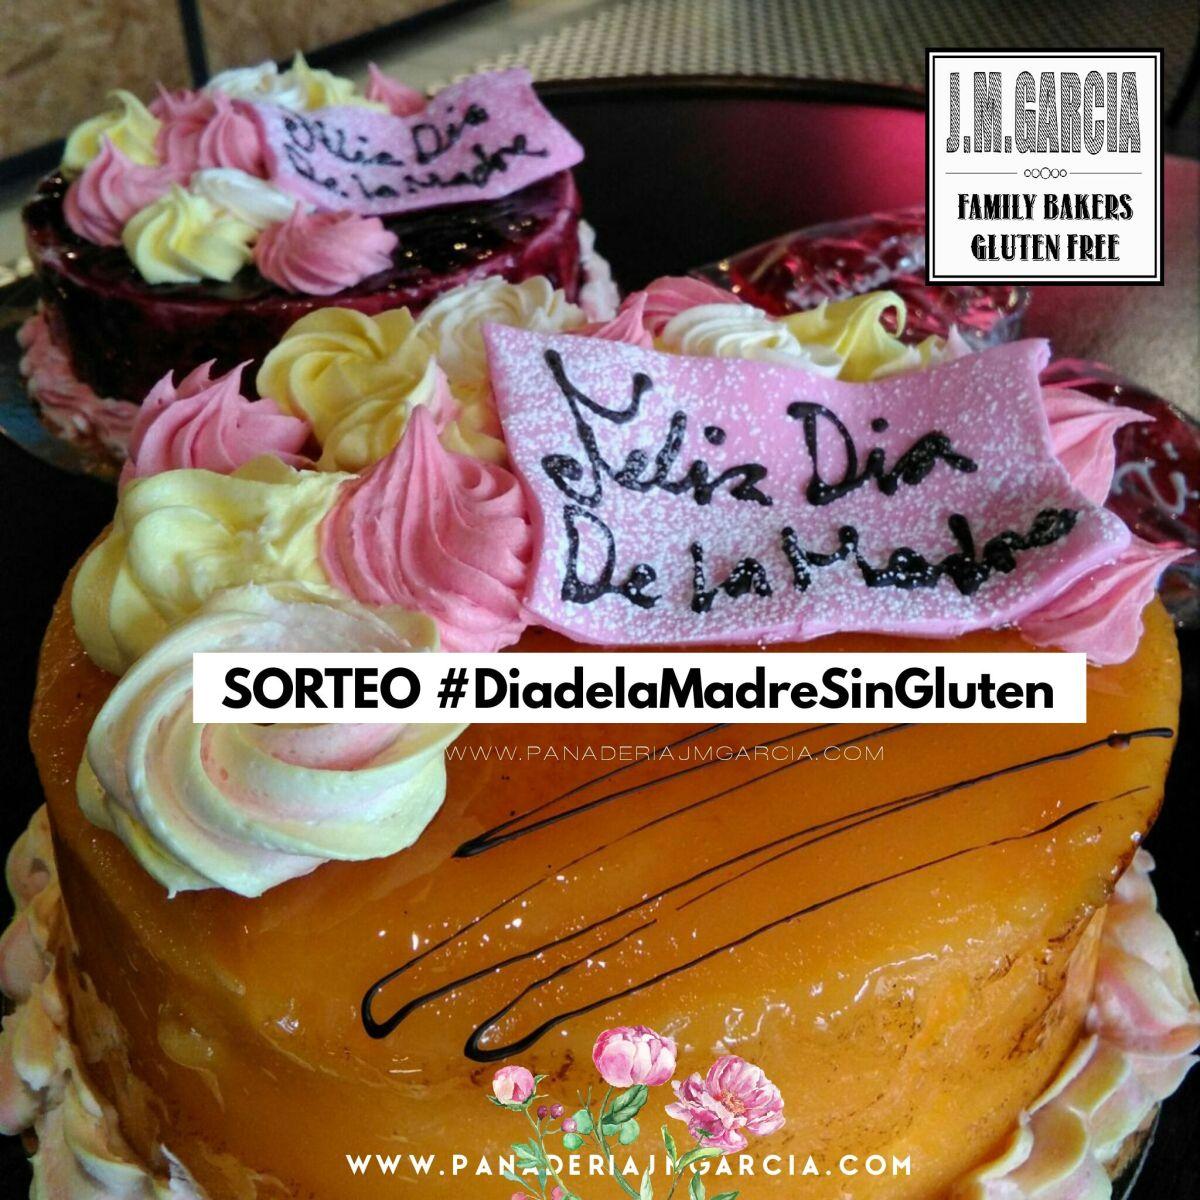 Dia_de_la_madre-sin_gluten-www.panaderiajmgarcia.com-alicante